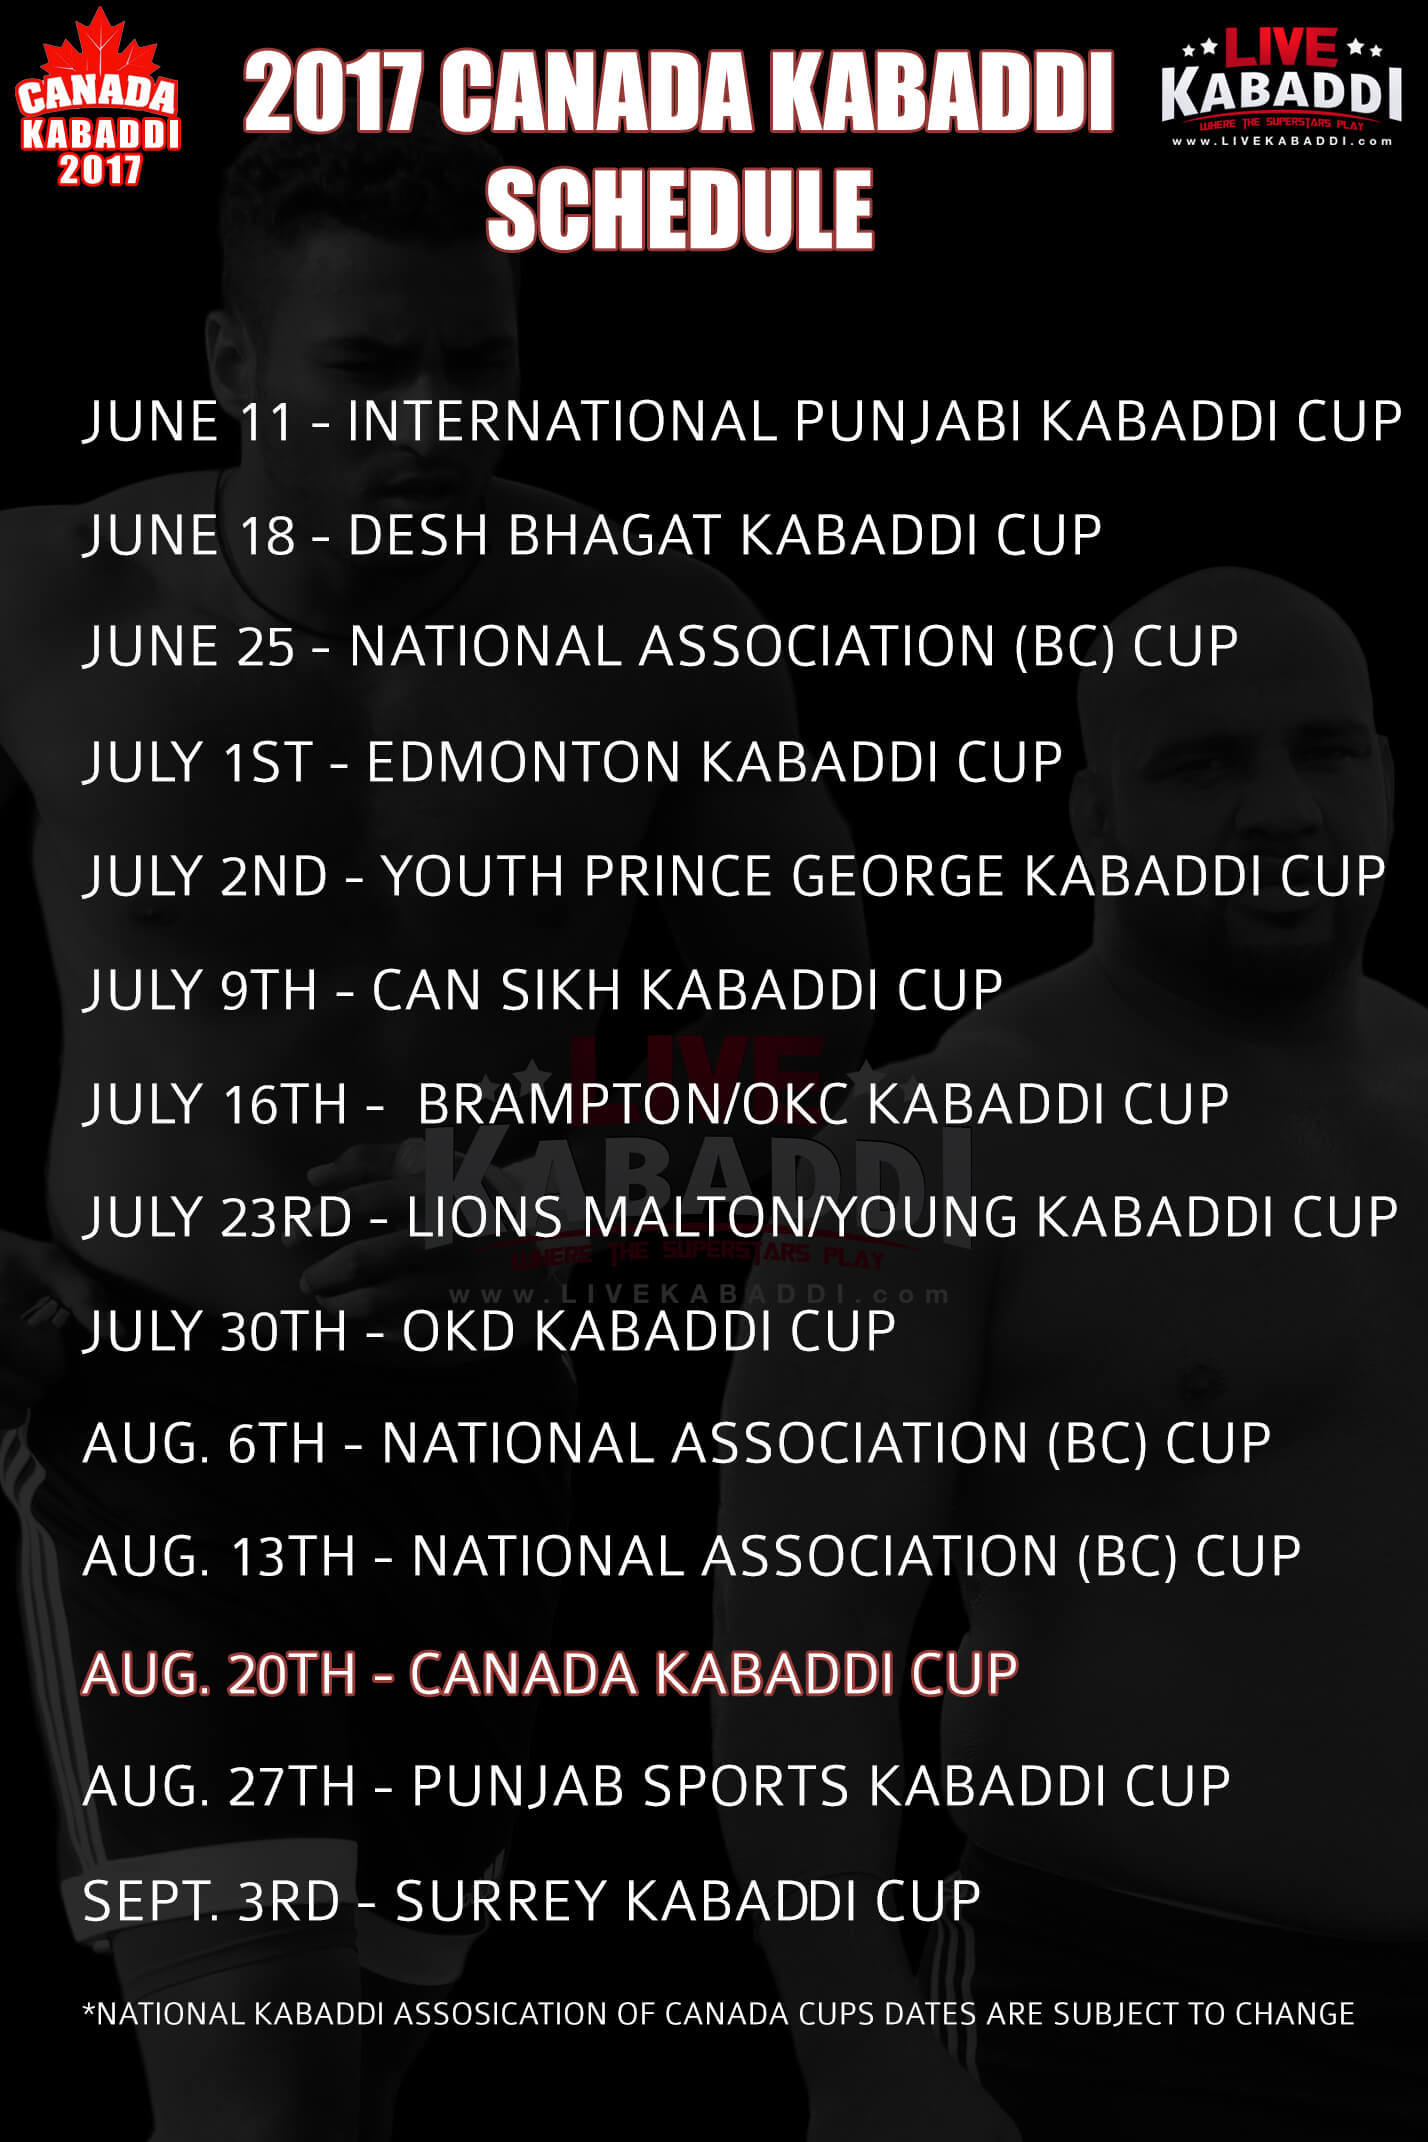 2017-canada-kabaddi-schedule